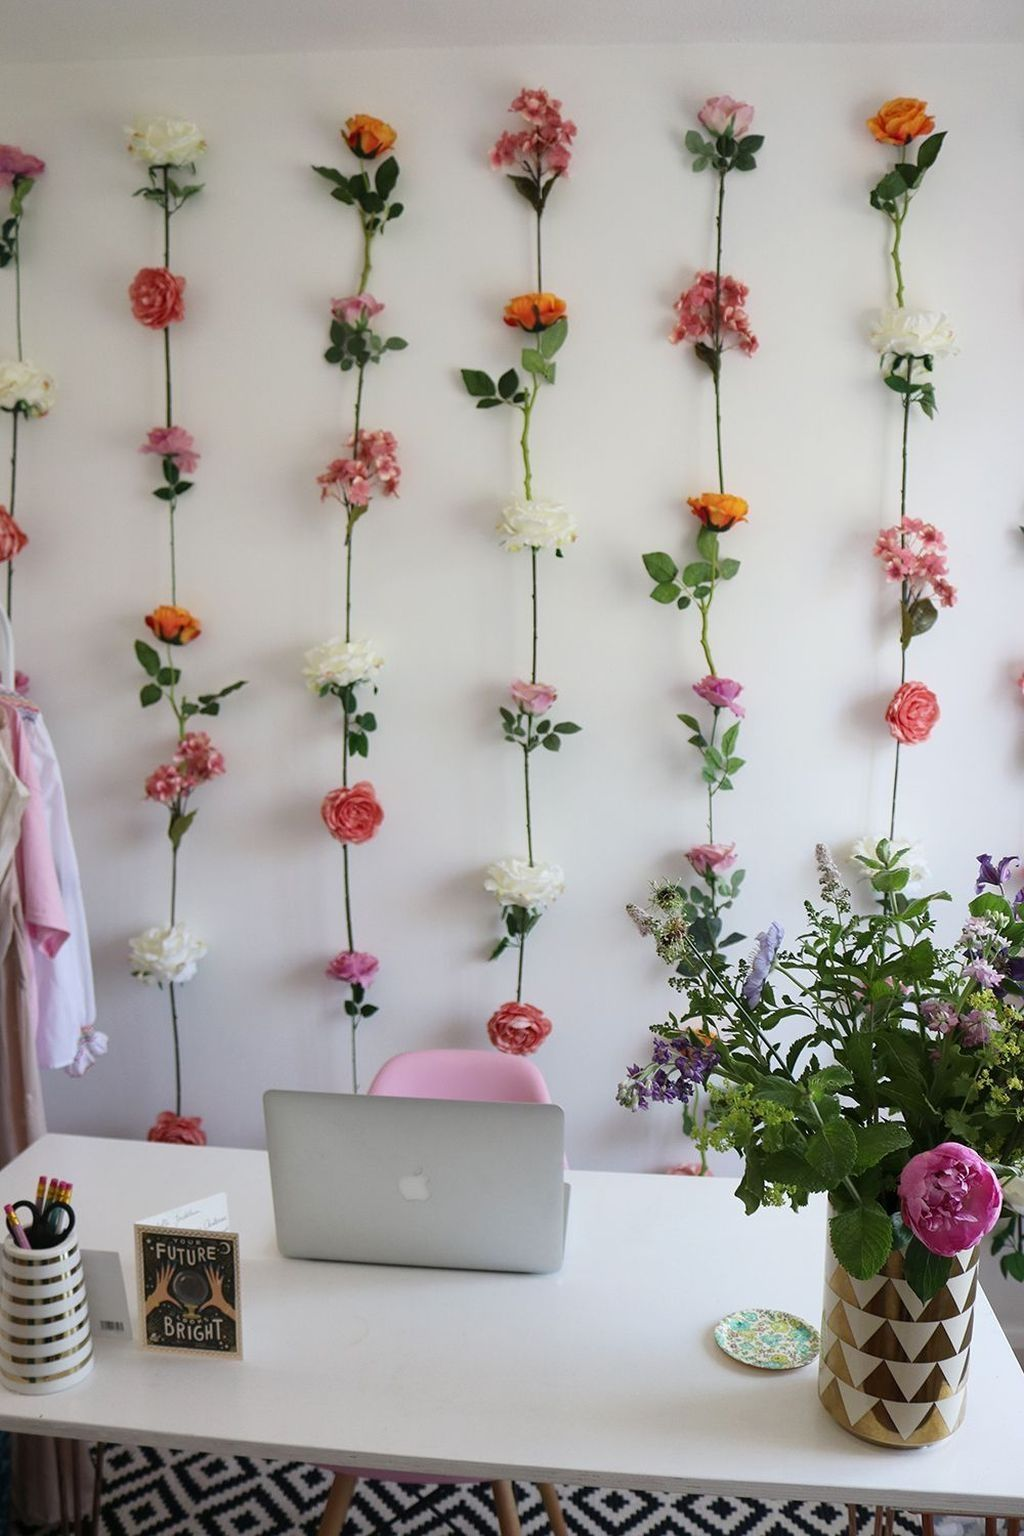 20 Outstanding Diy Flower Wall Decoration Ideas For You To Try Diy Flower Wall Flower Wall Decor Fake Flowers Decor